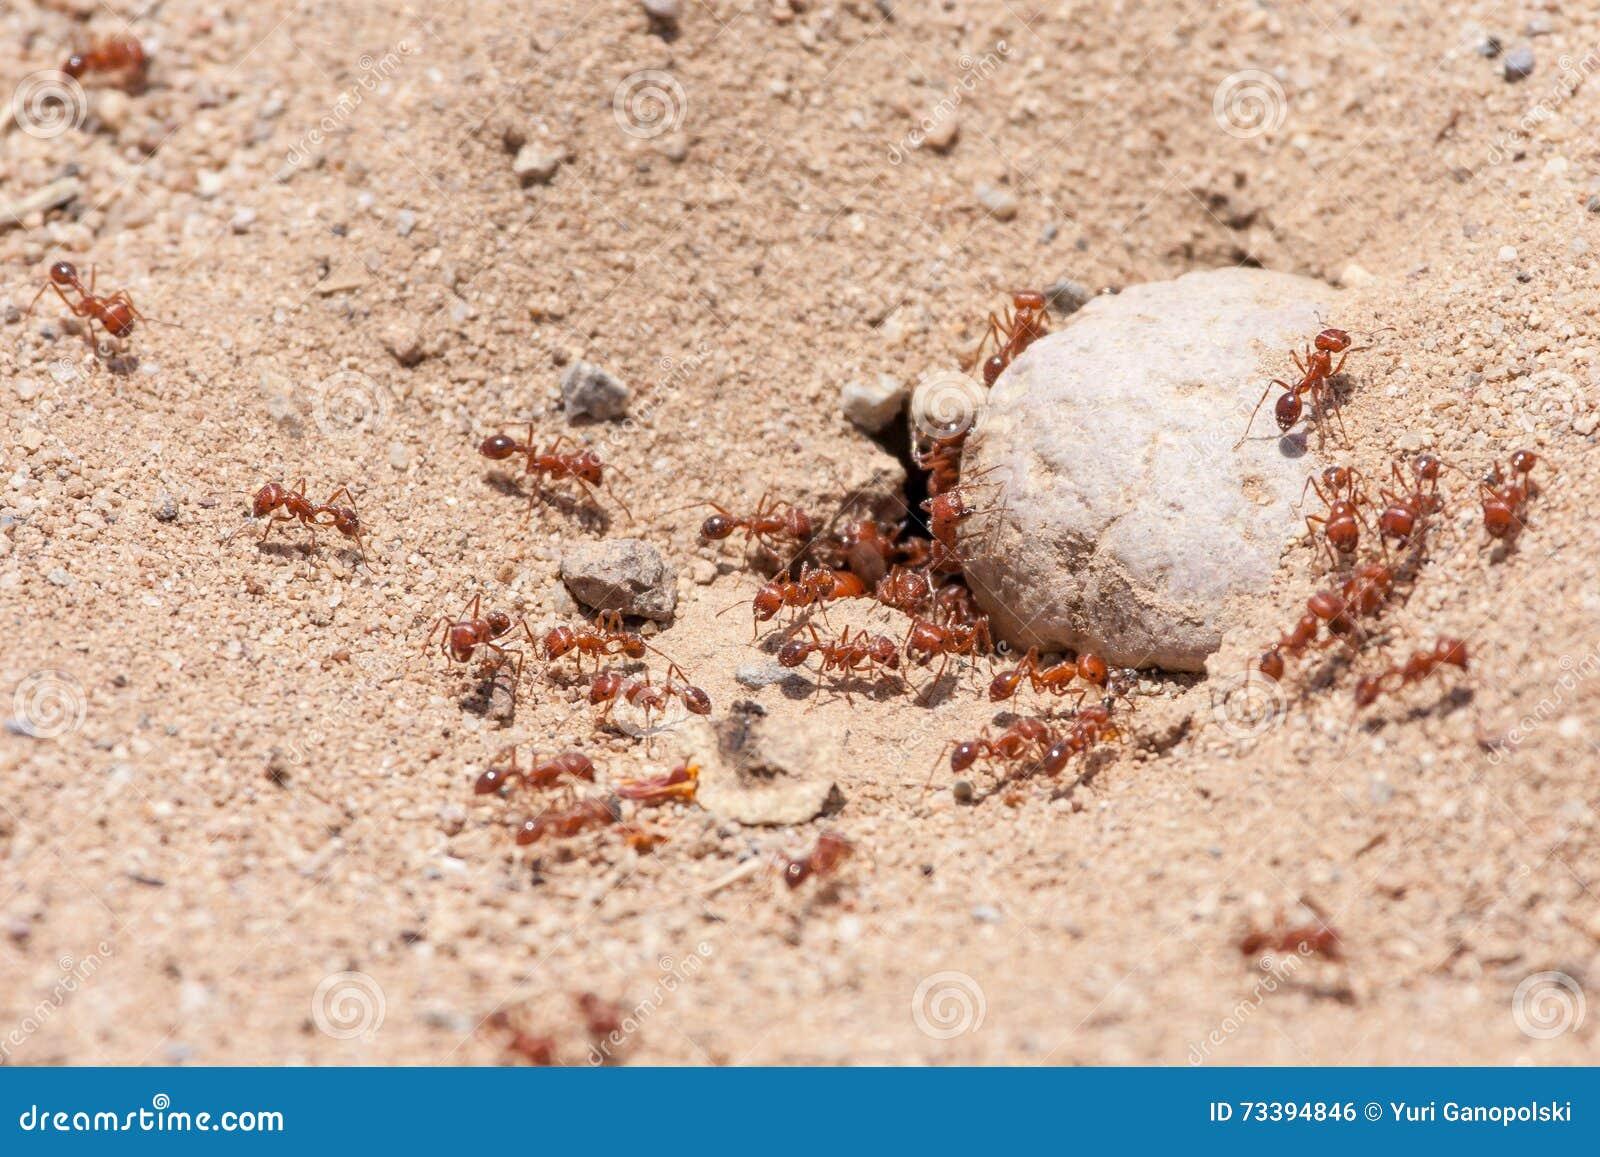 Fire Ants Colony at Laguna Coast Wilderness Park